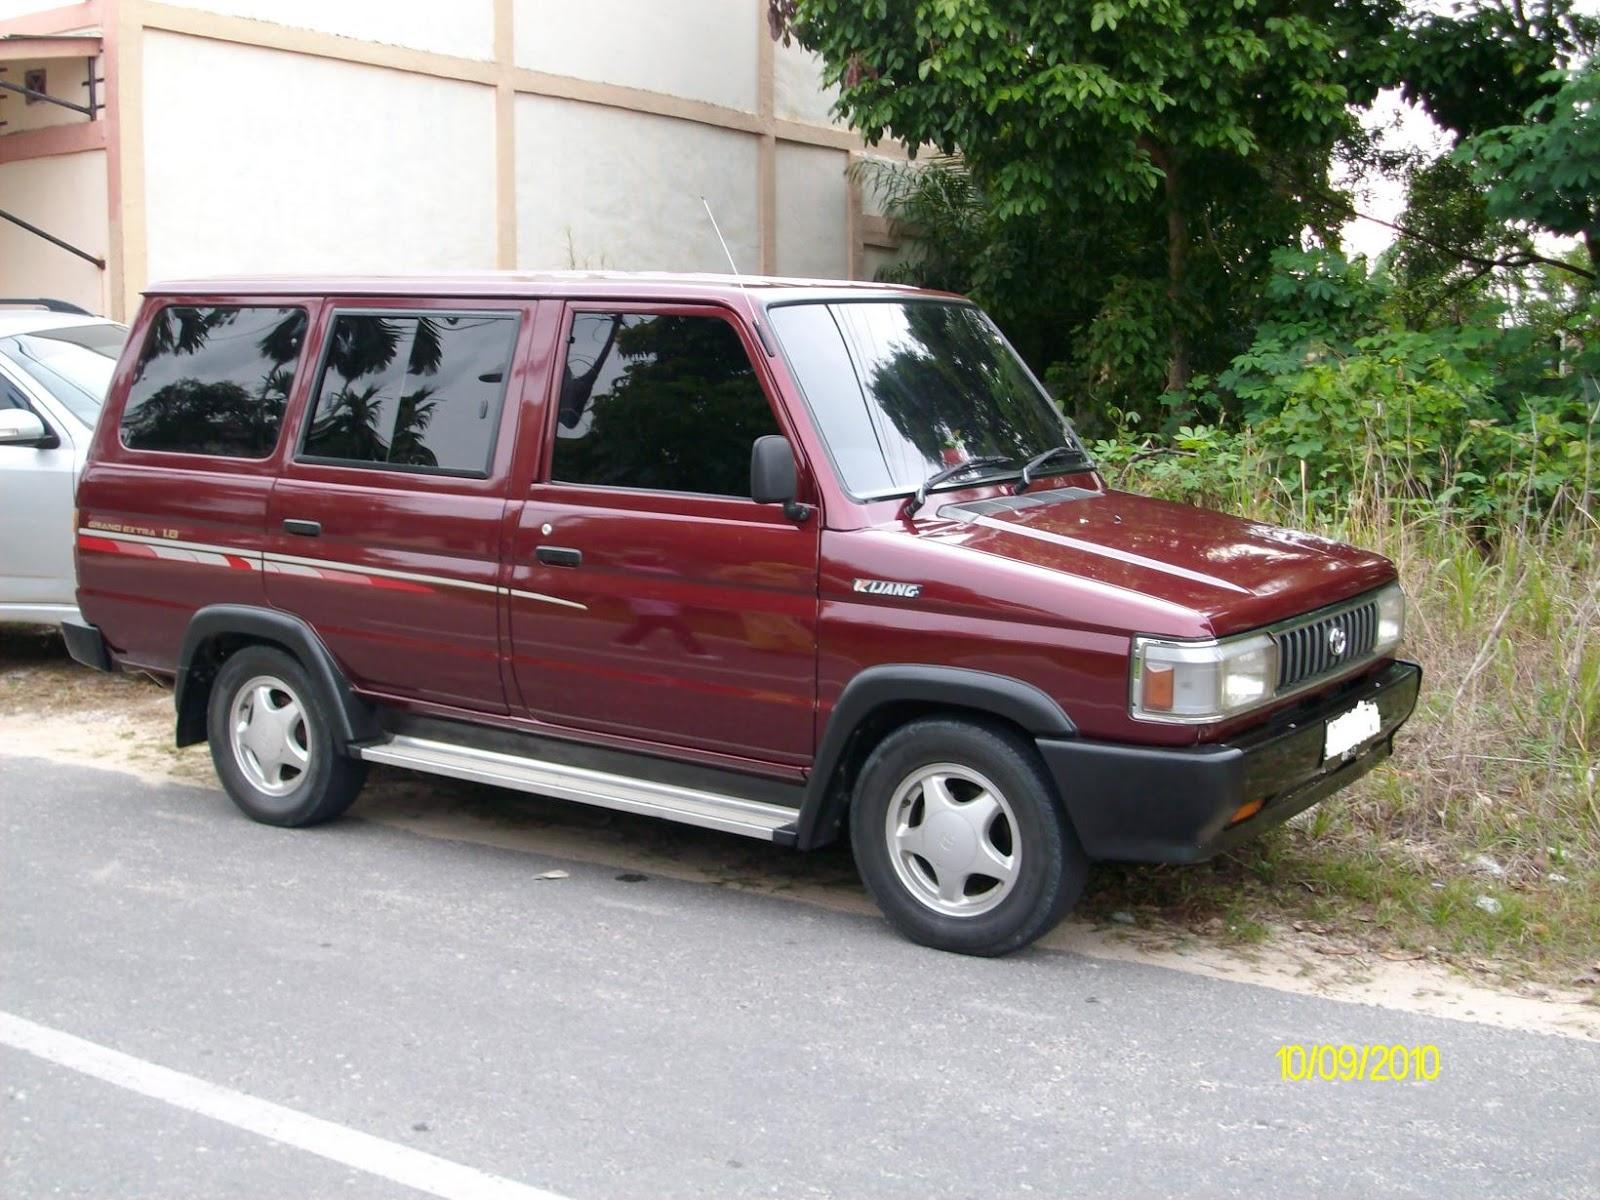 grand new avanza olx jateng all toyota camry 2019 indonesia dijual kijang extra sgx 1 8 mobil bekas